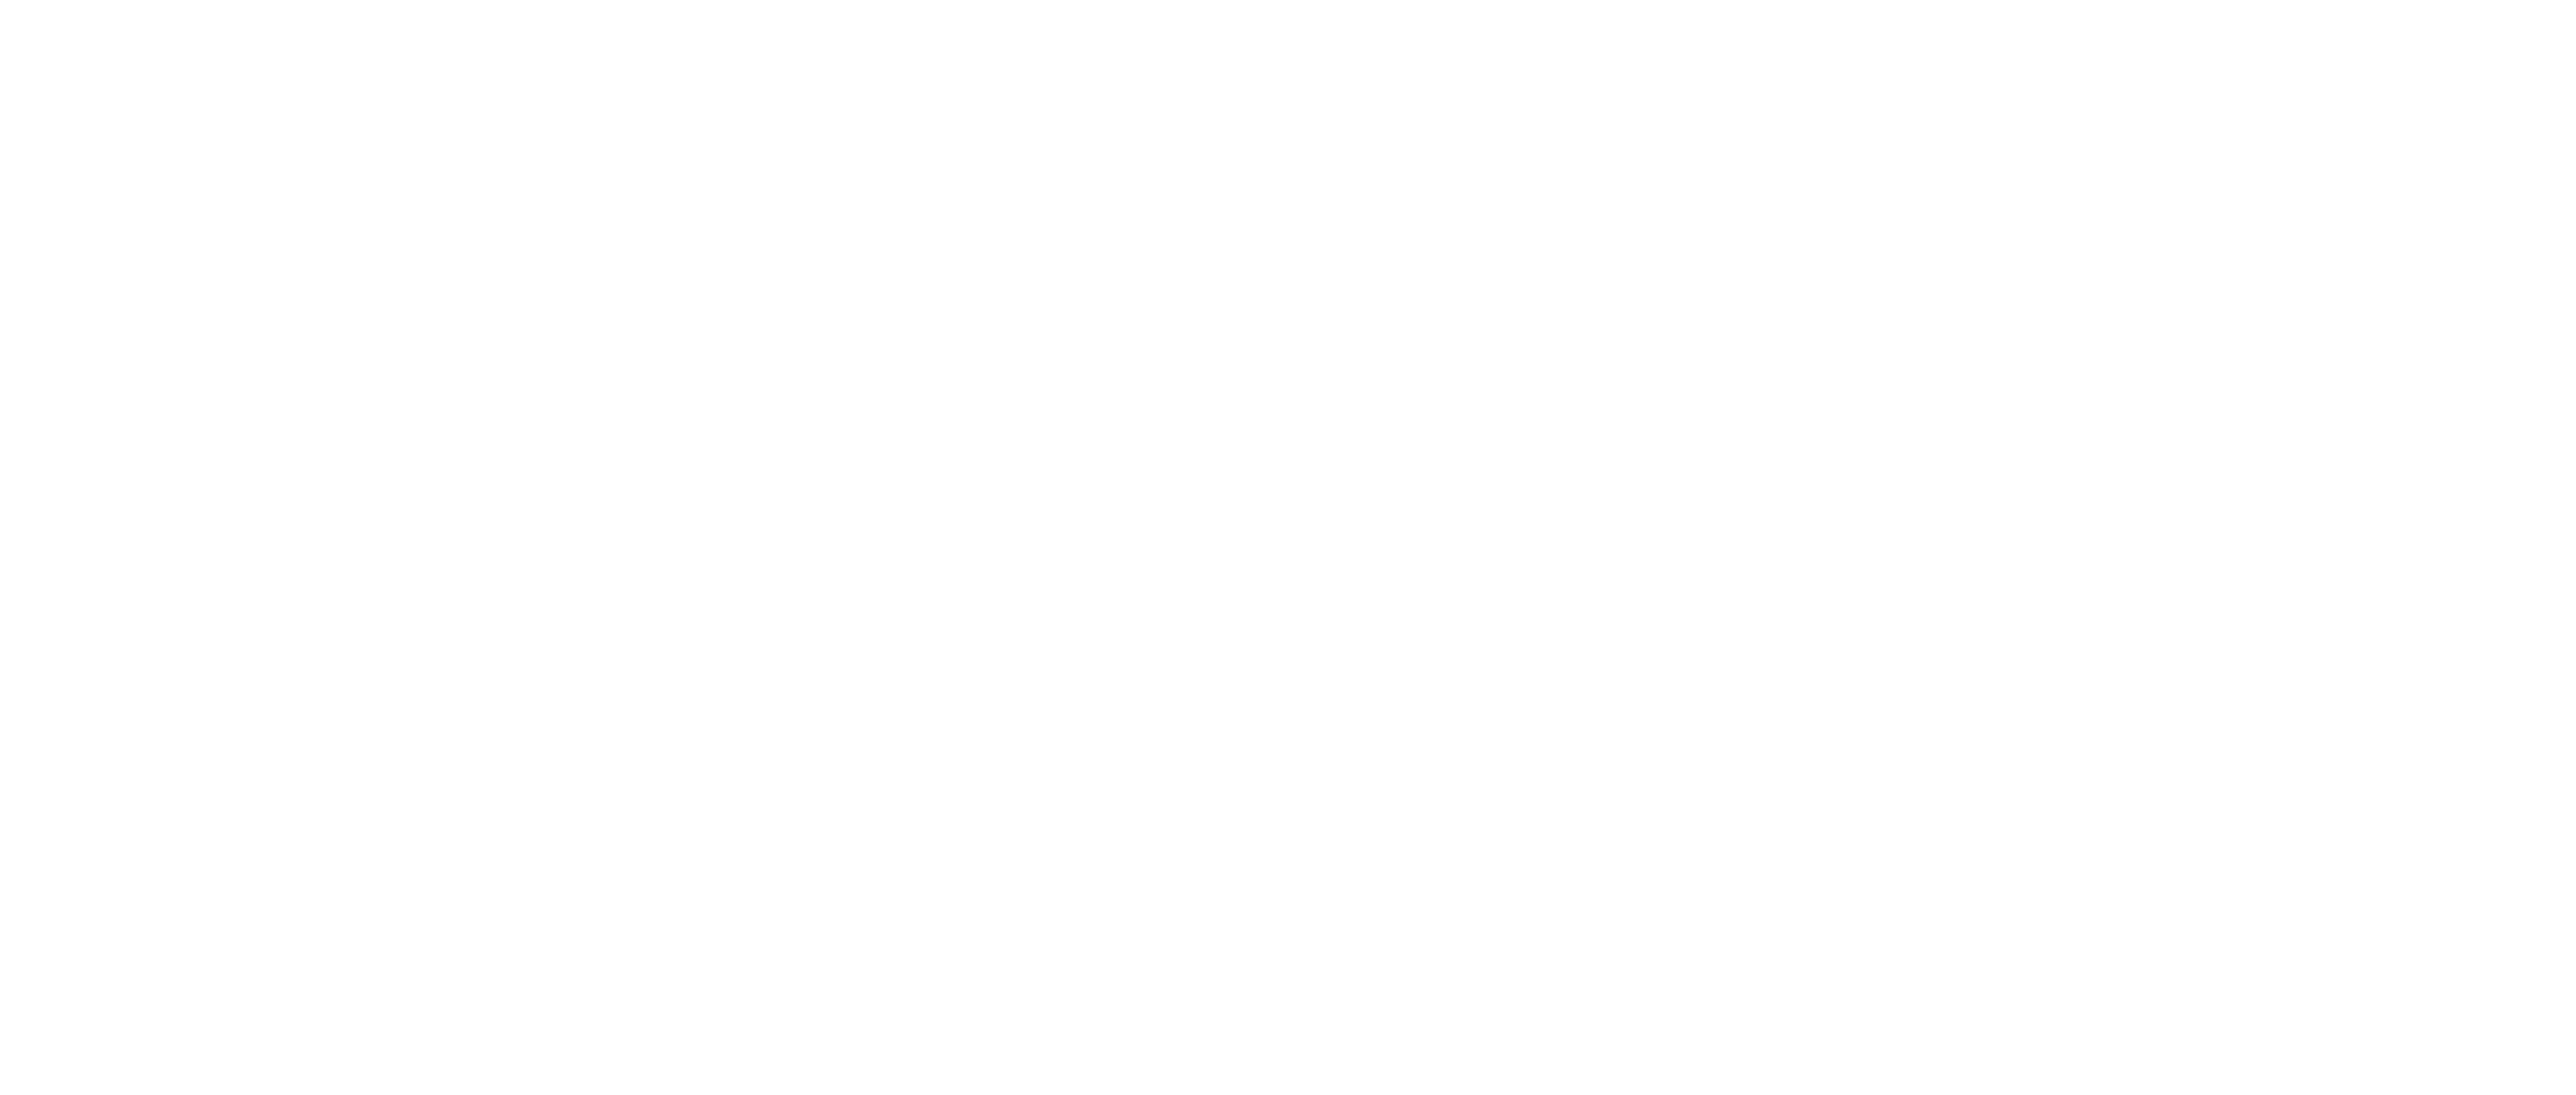 KrzyzowskiProjekt